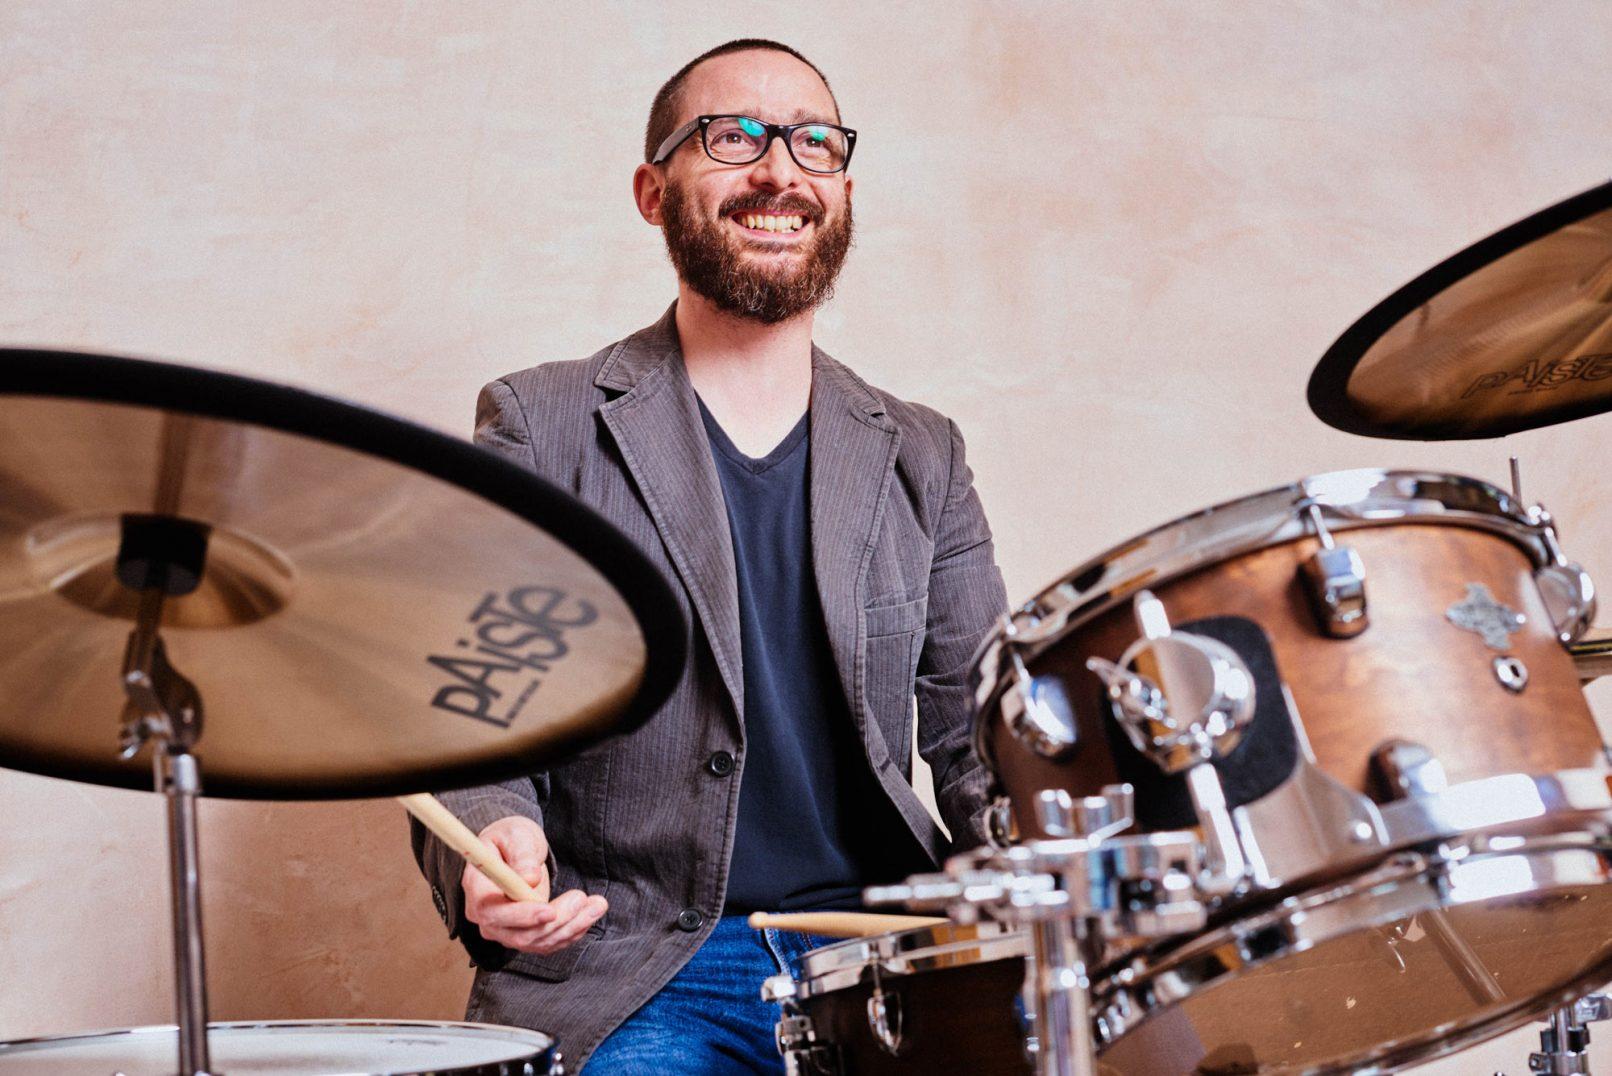 Hugh-Lawrence-Liberty-Drums-002-1612x1076